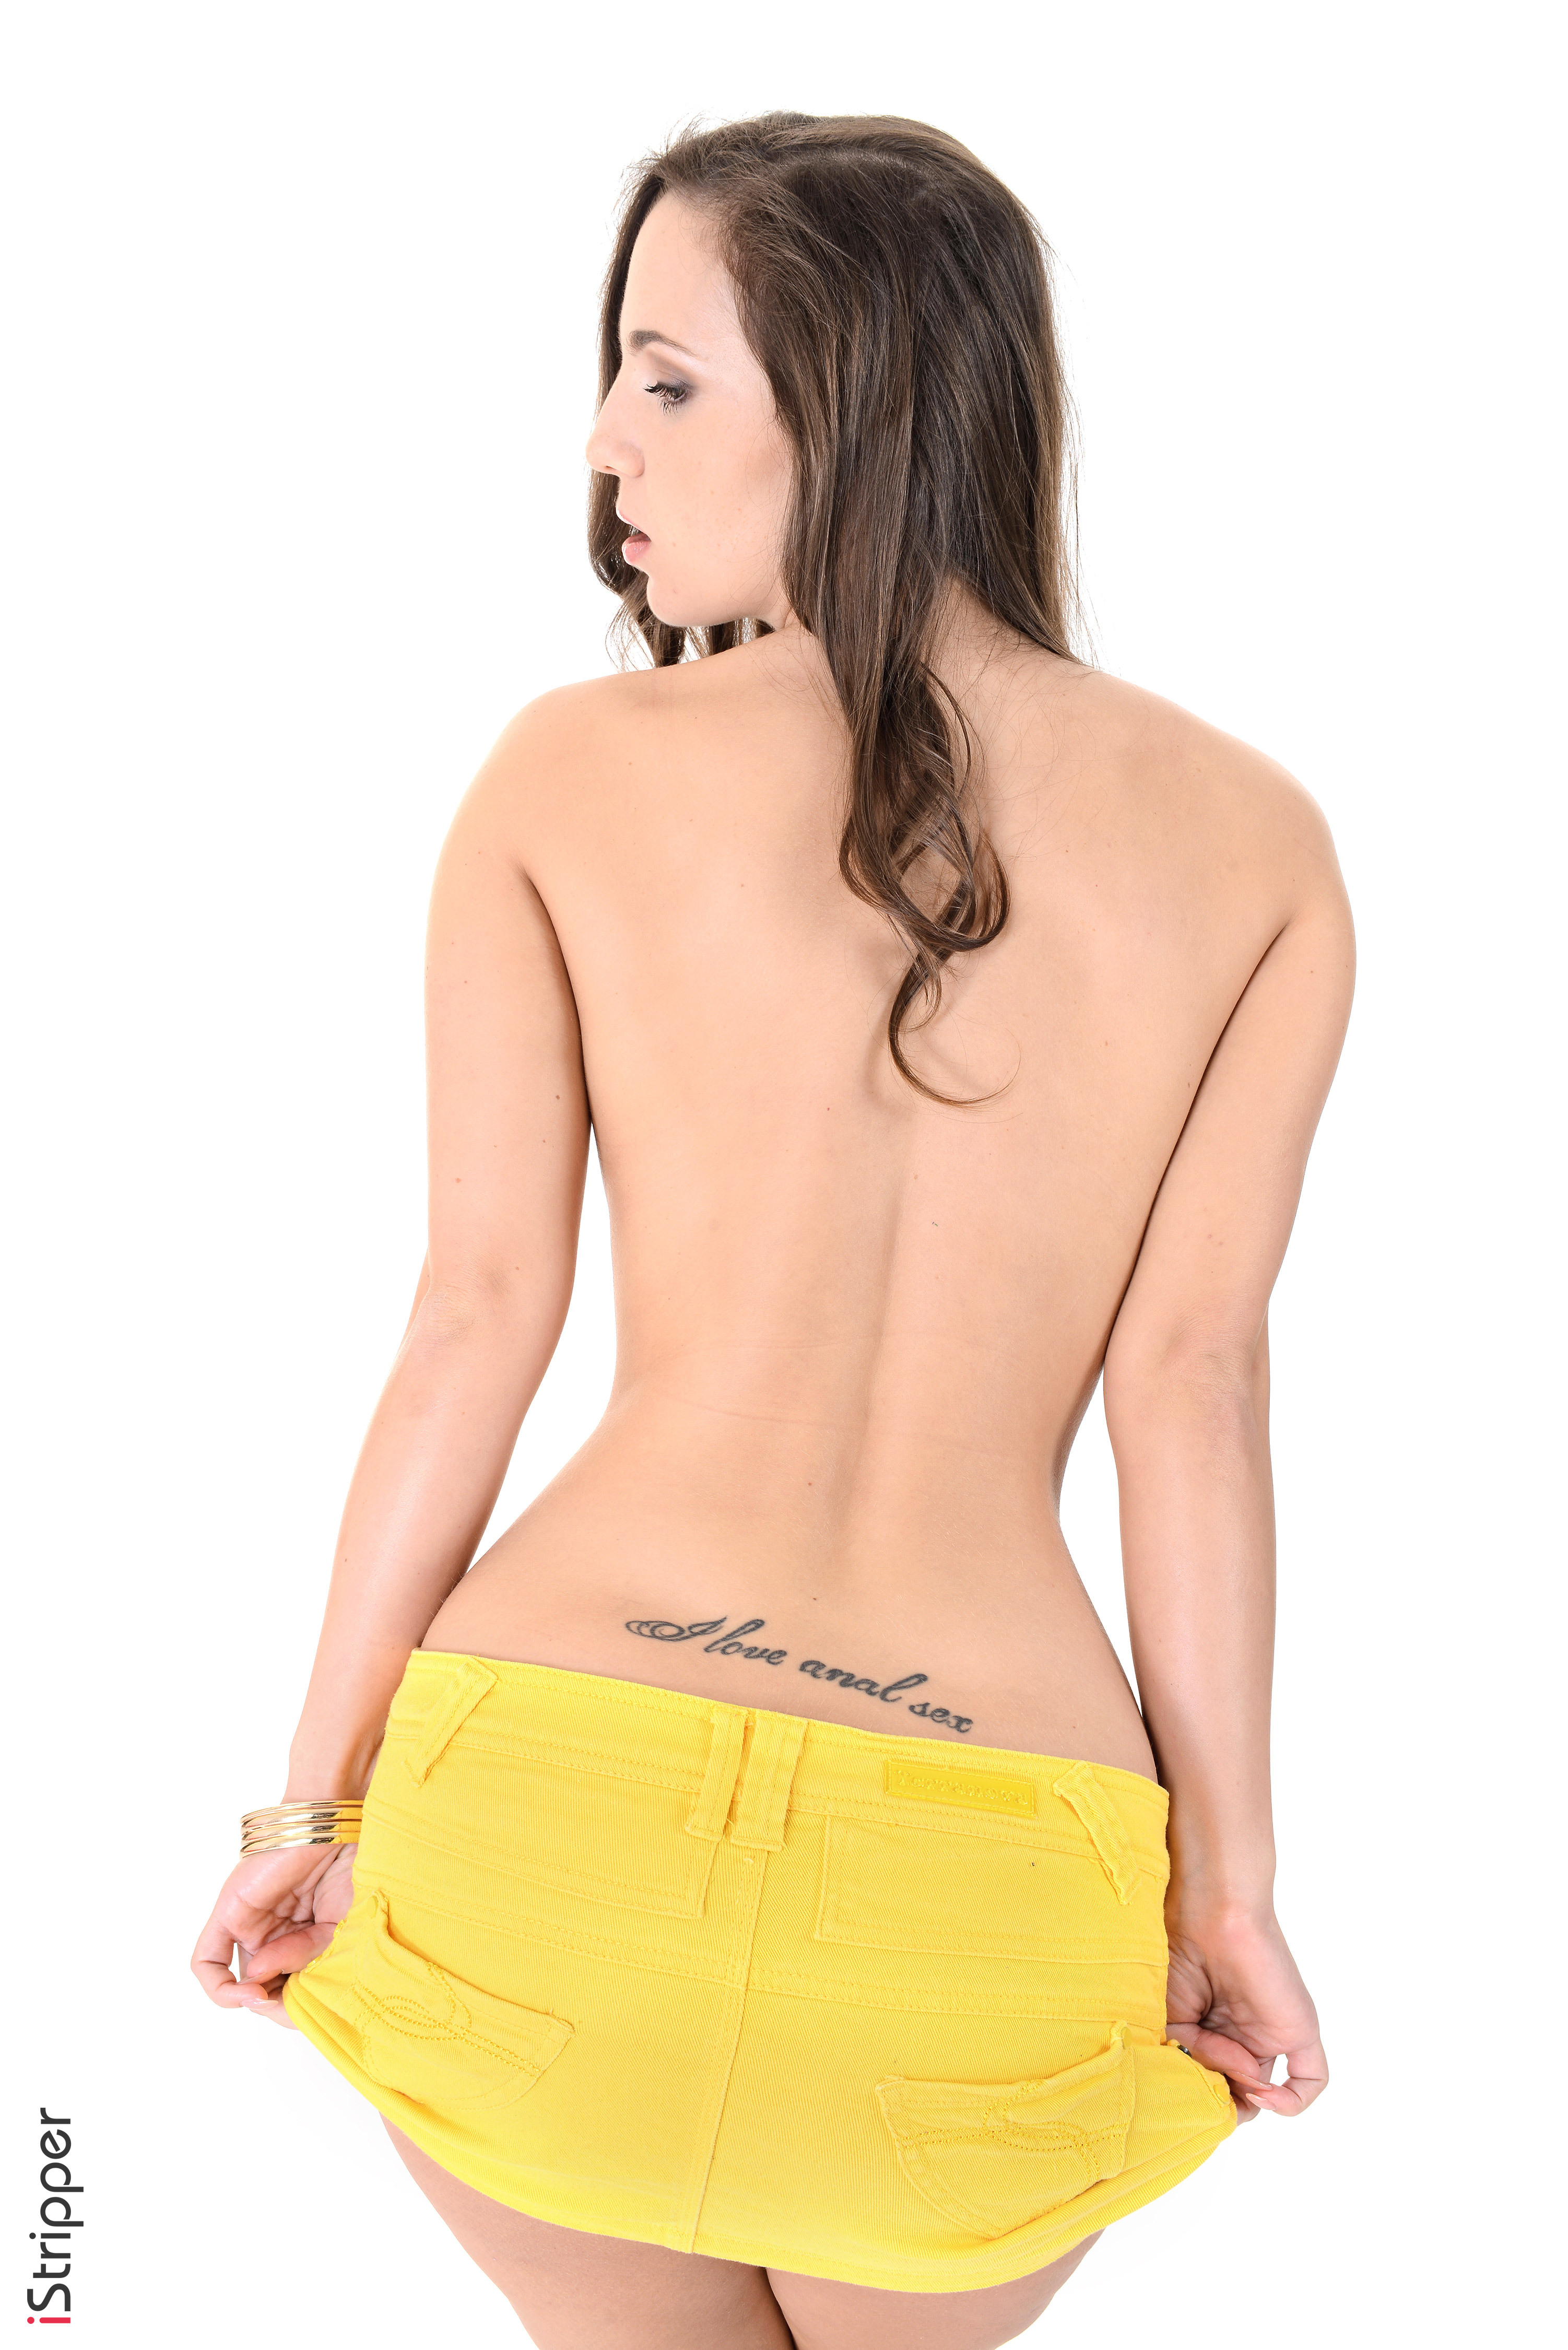 wallpapers nude girl